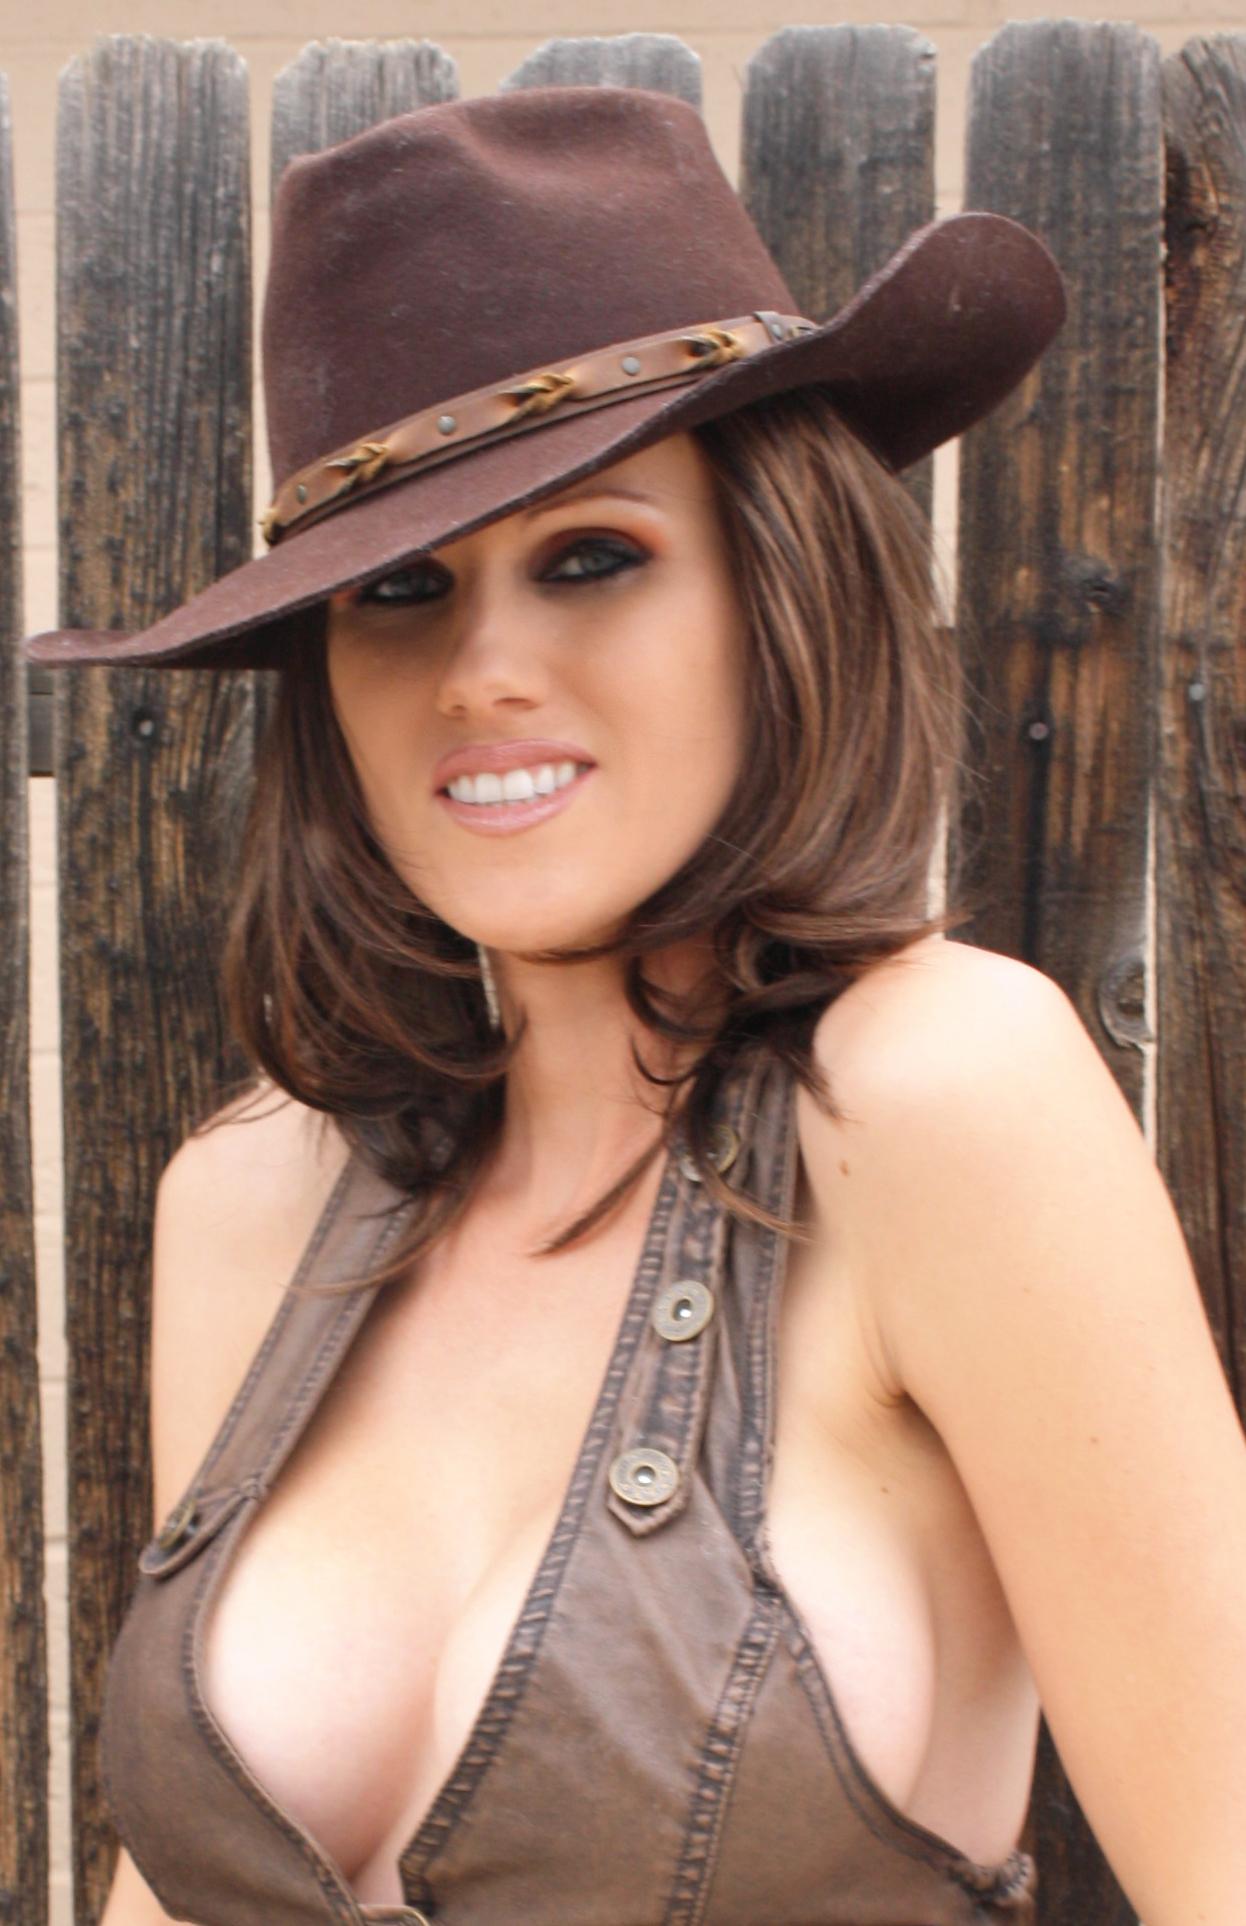 cowgirl 2 11x17 azpowergirl cosplay print · alfred trujillo & az